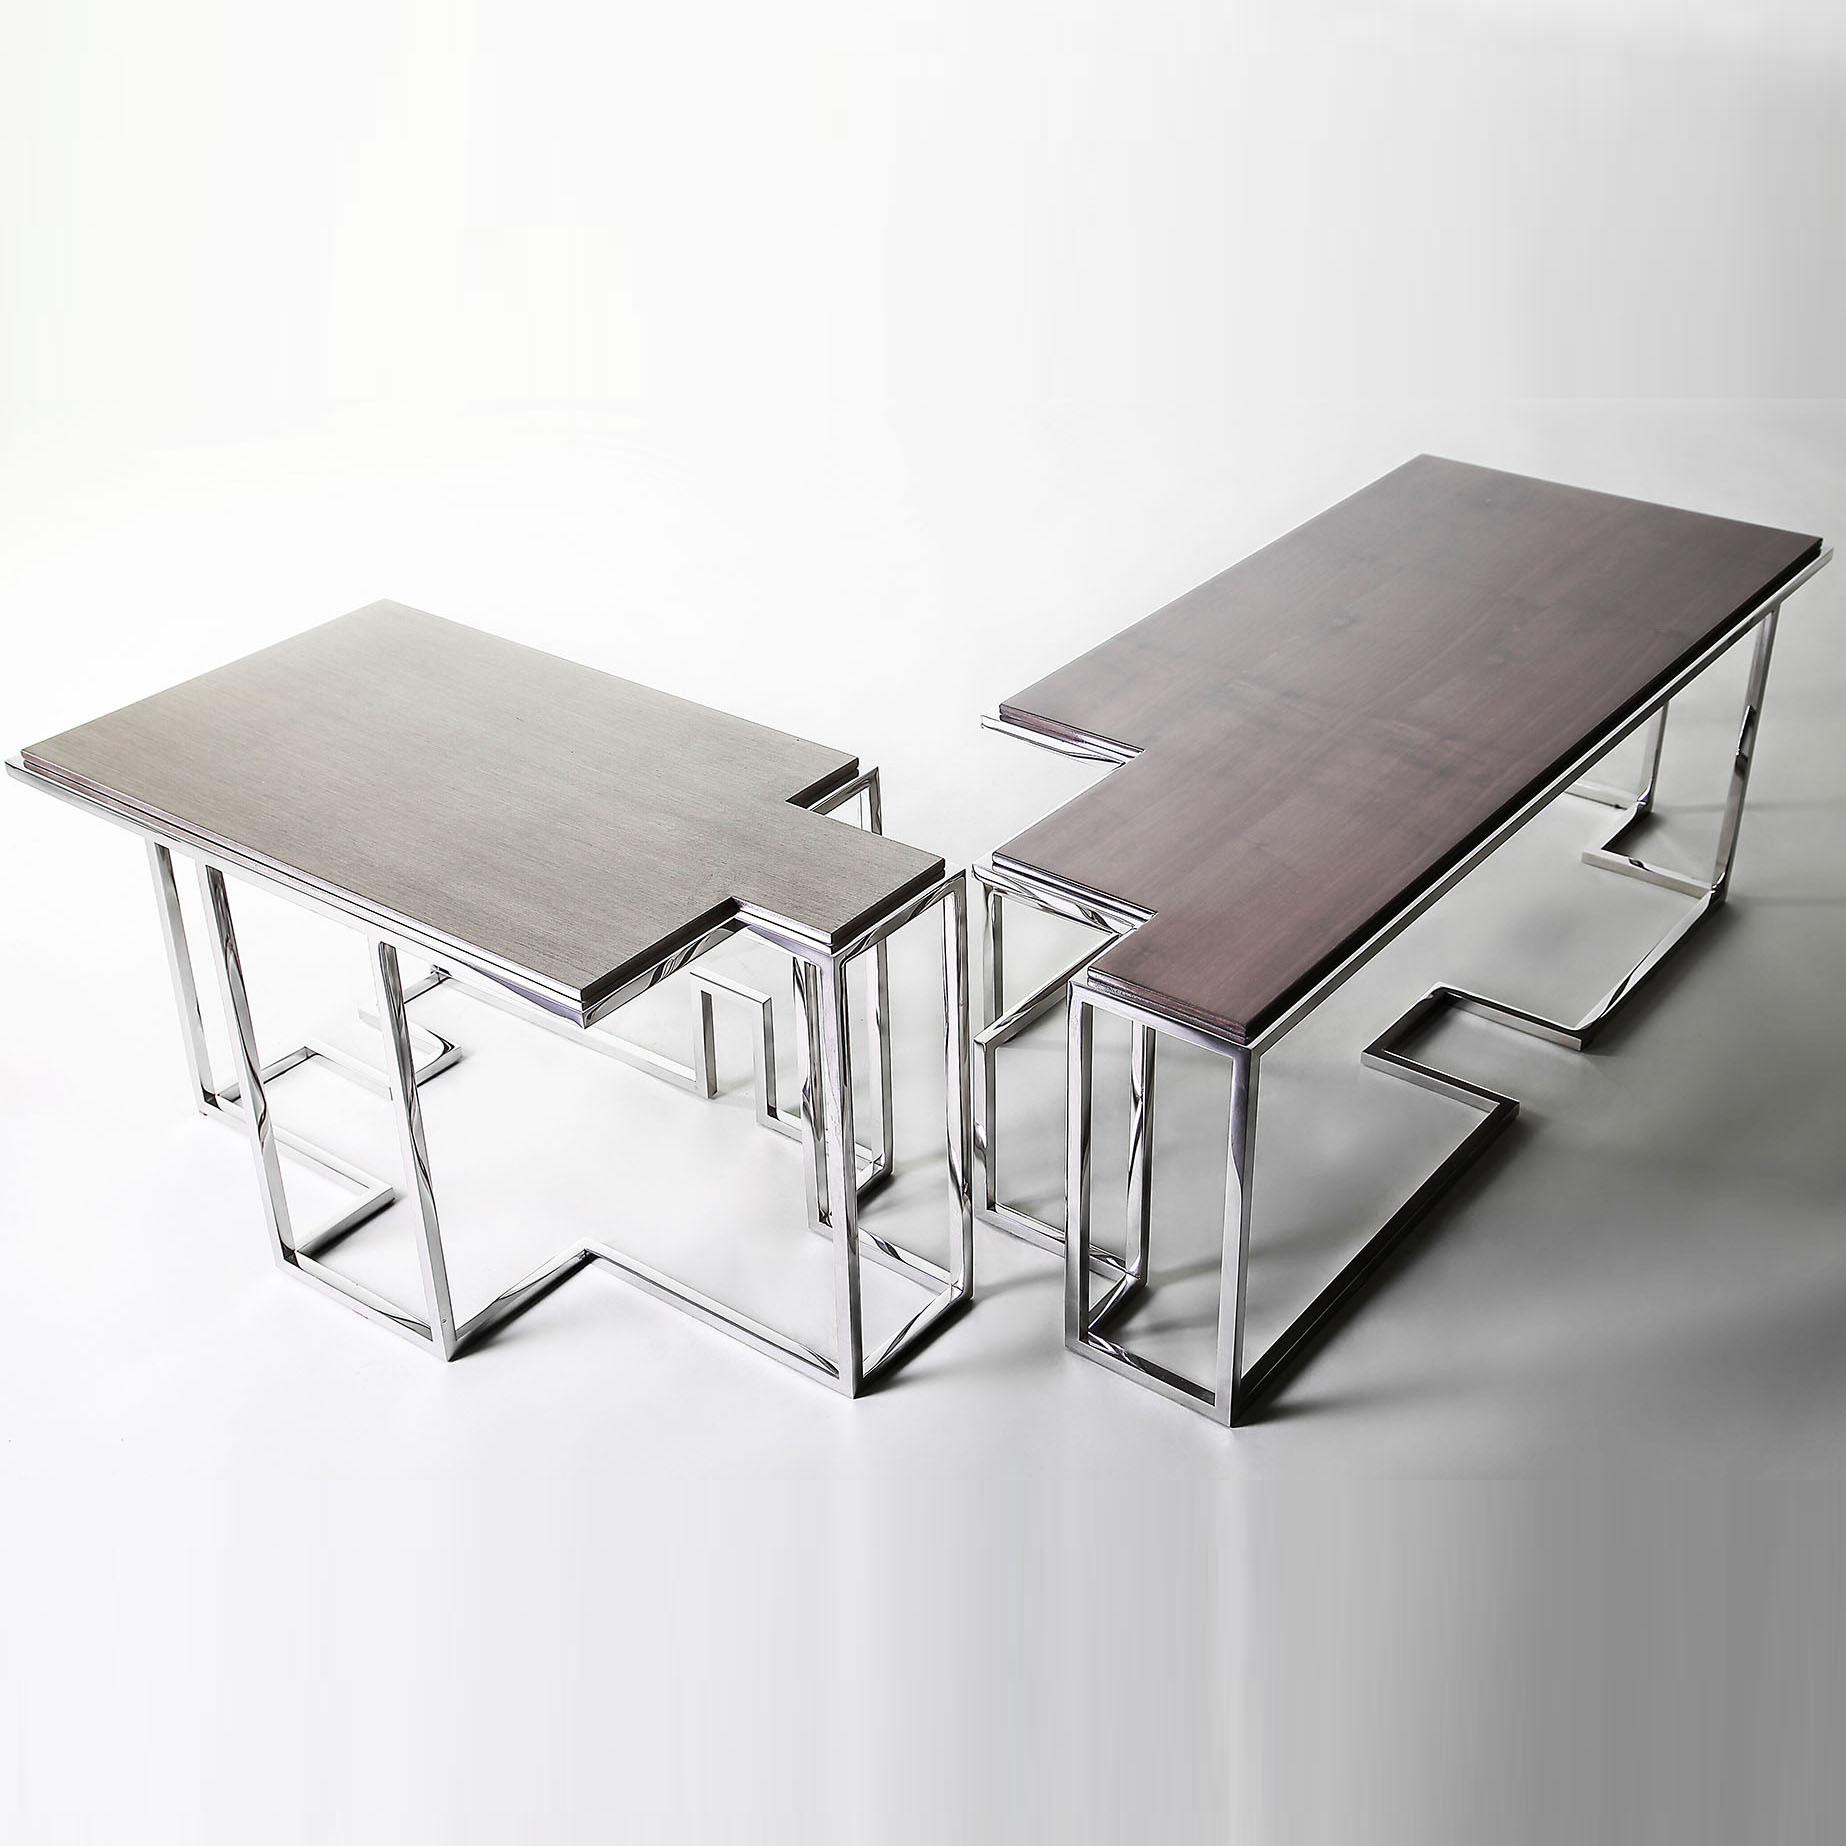 TETRA - Coffee Table